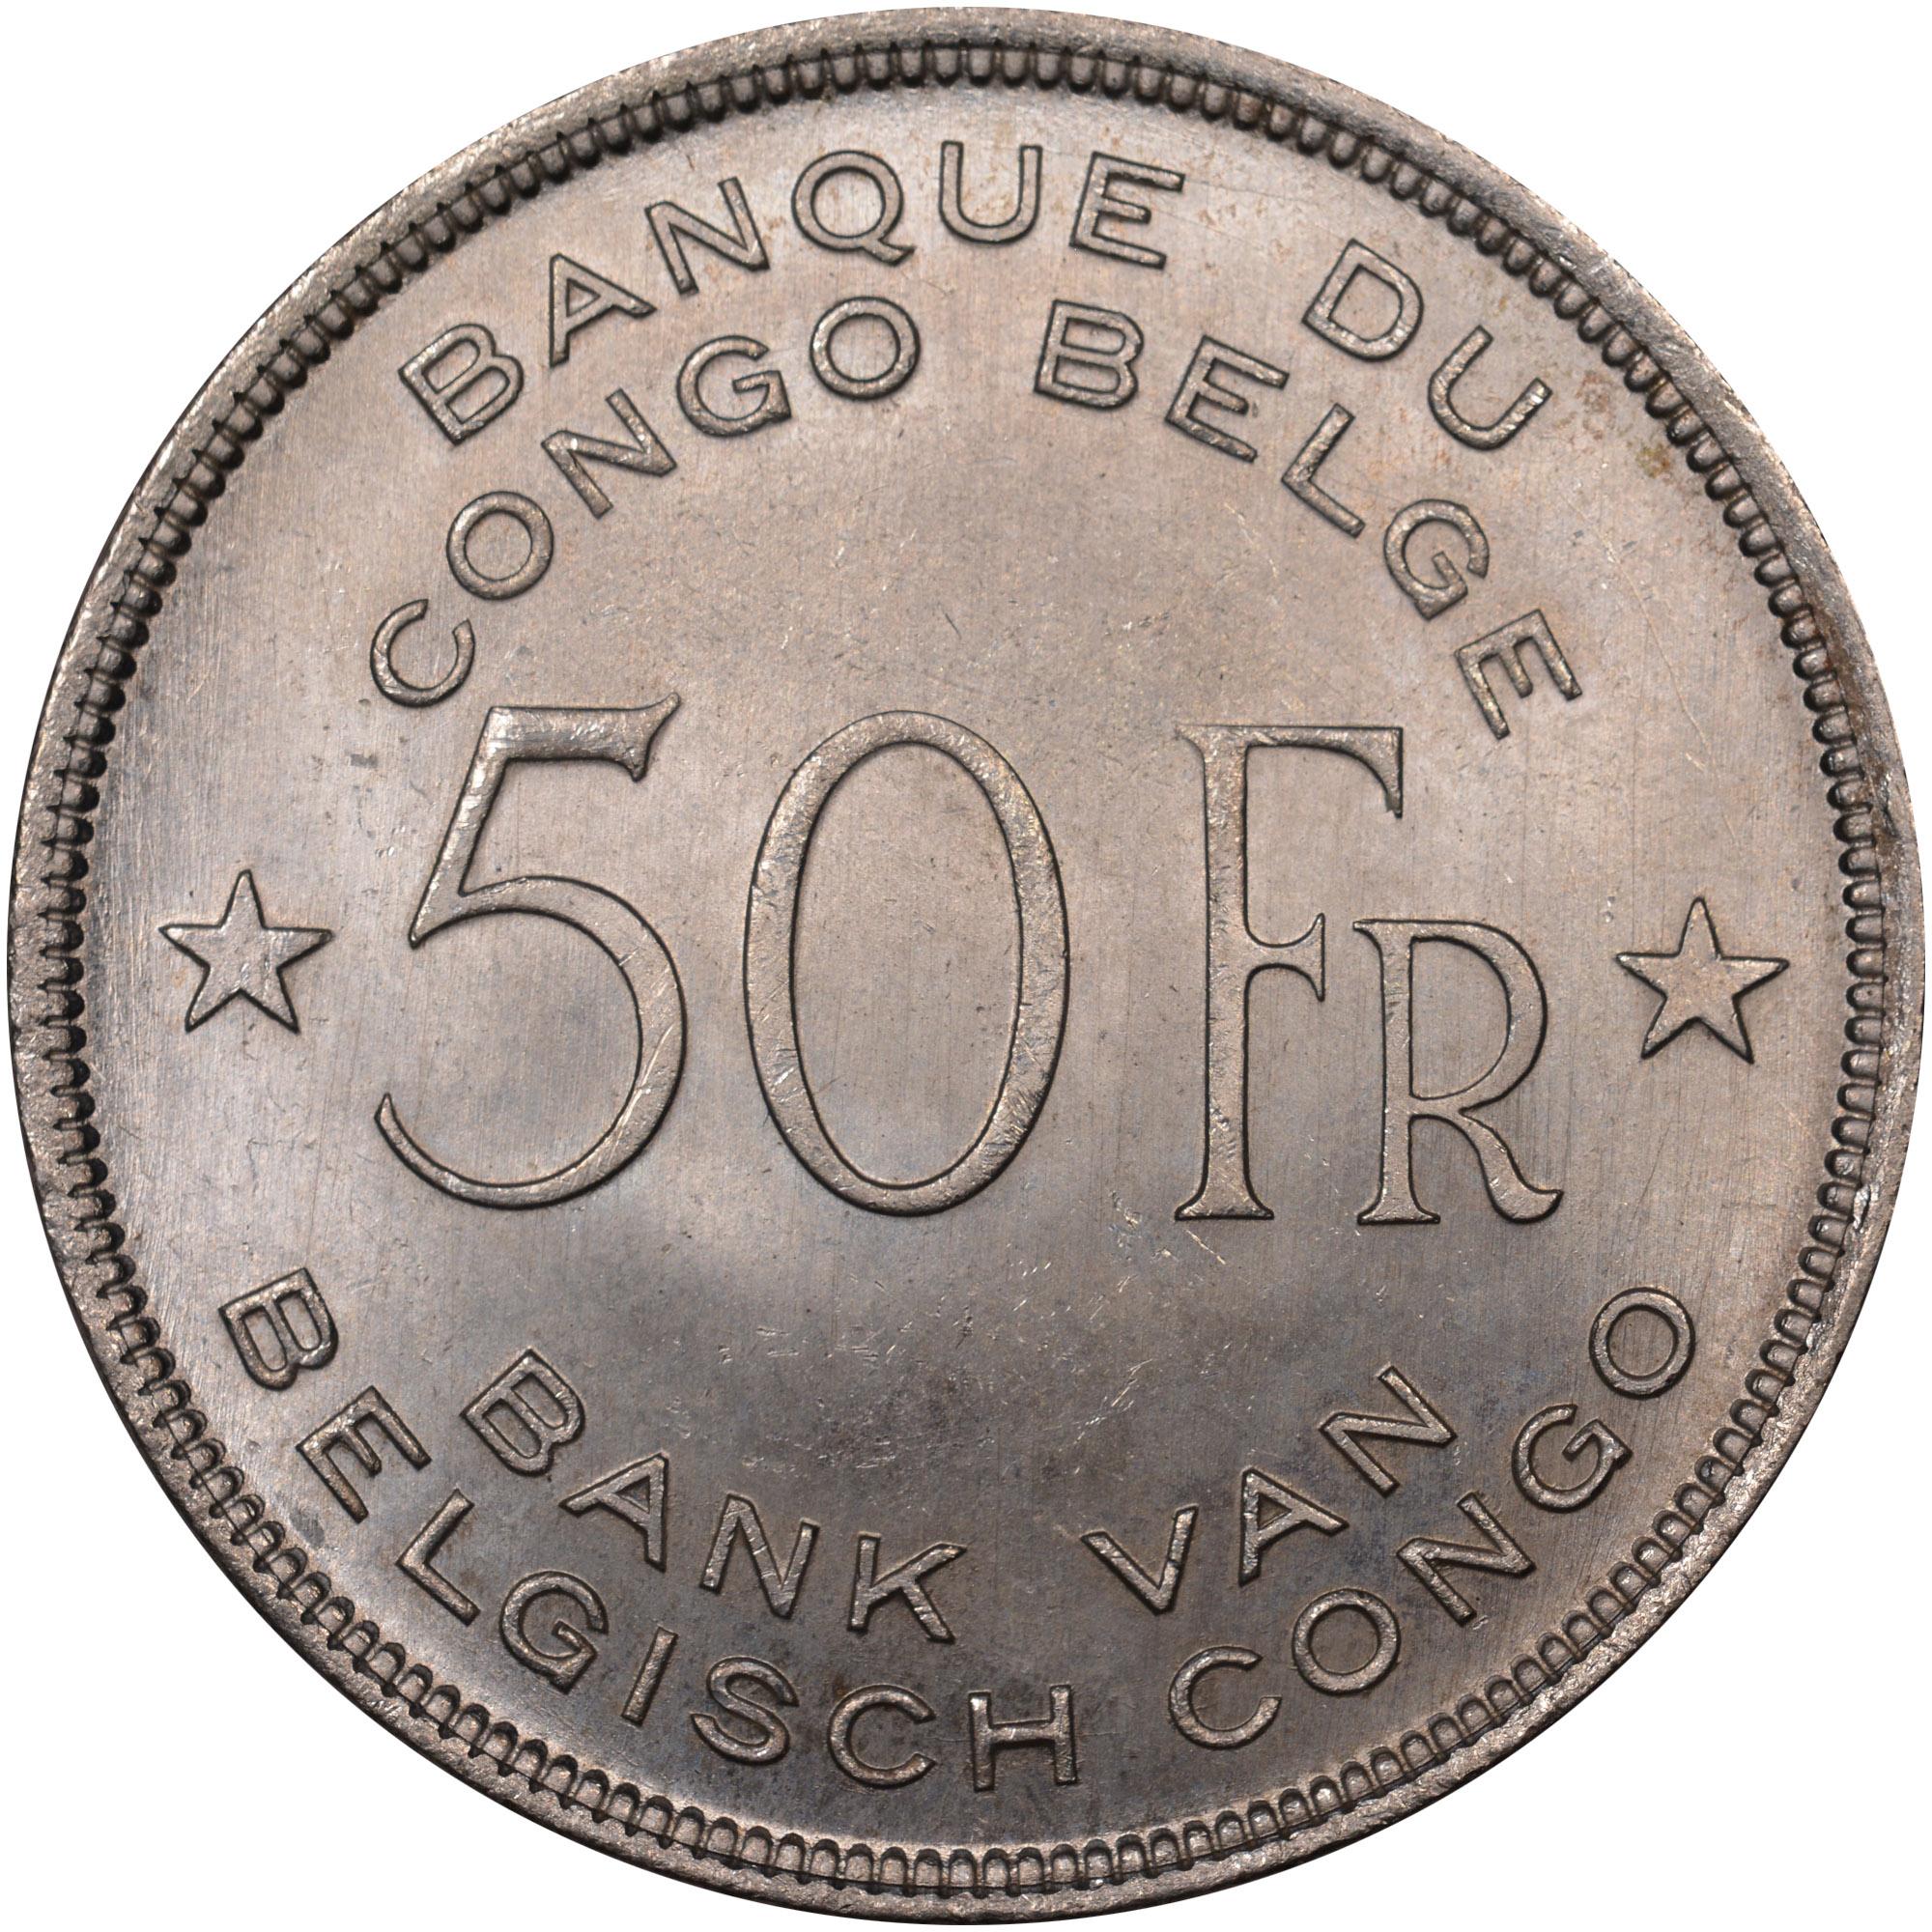 1944 Belgian Congo 50 Francs obverse